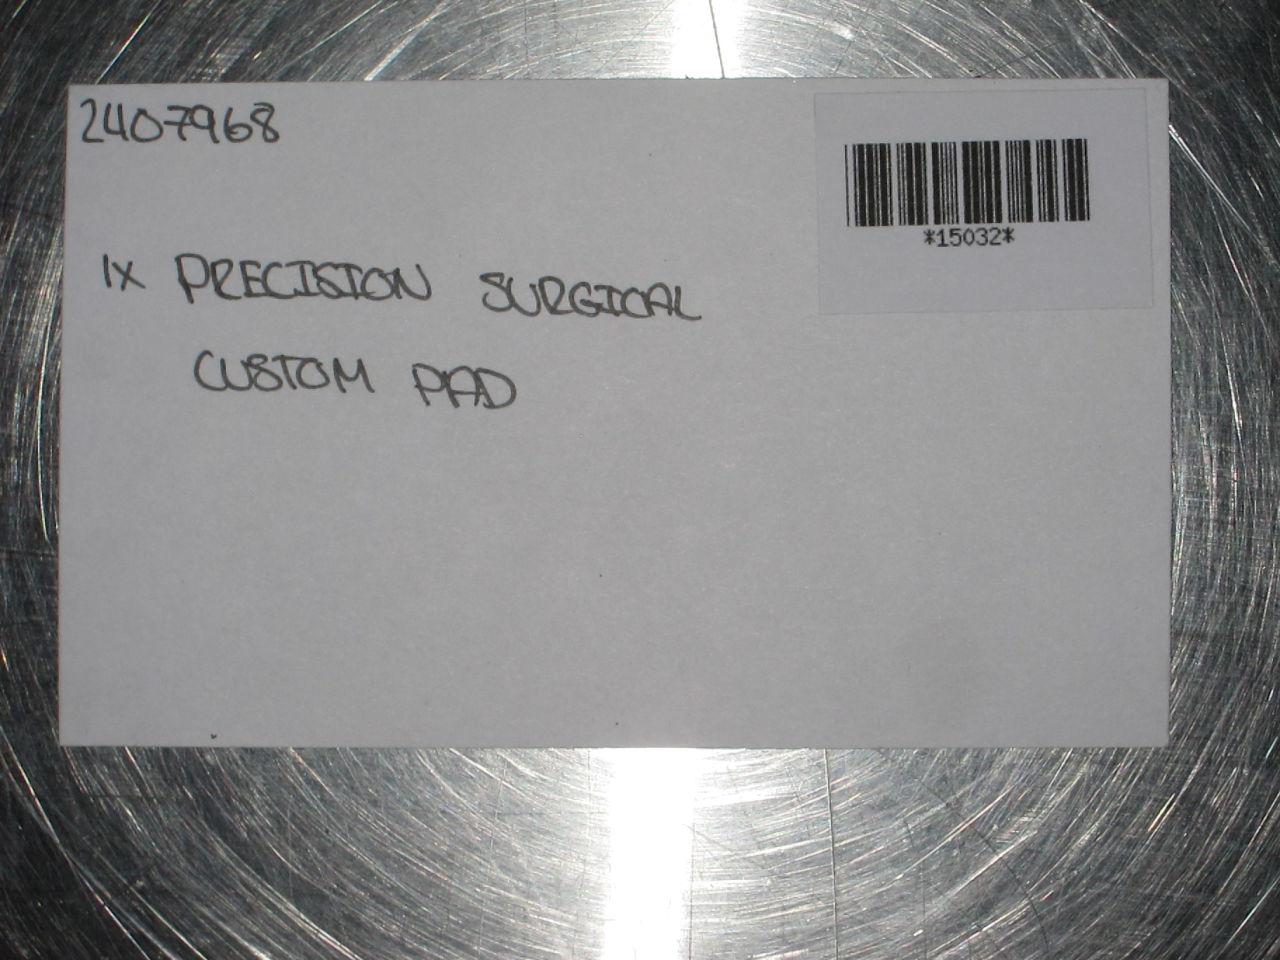 PRECISION SURGICAL Custom Pad